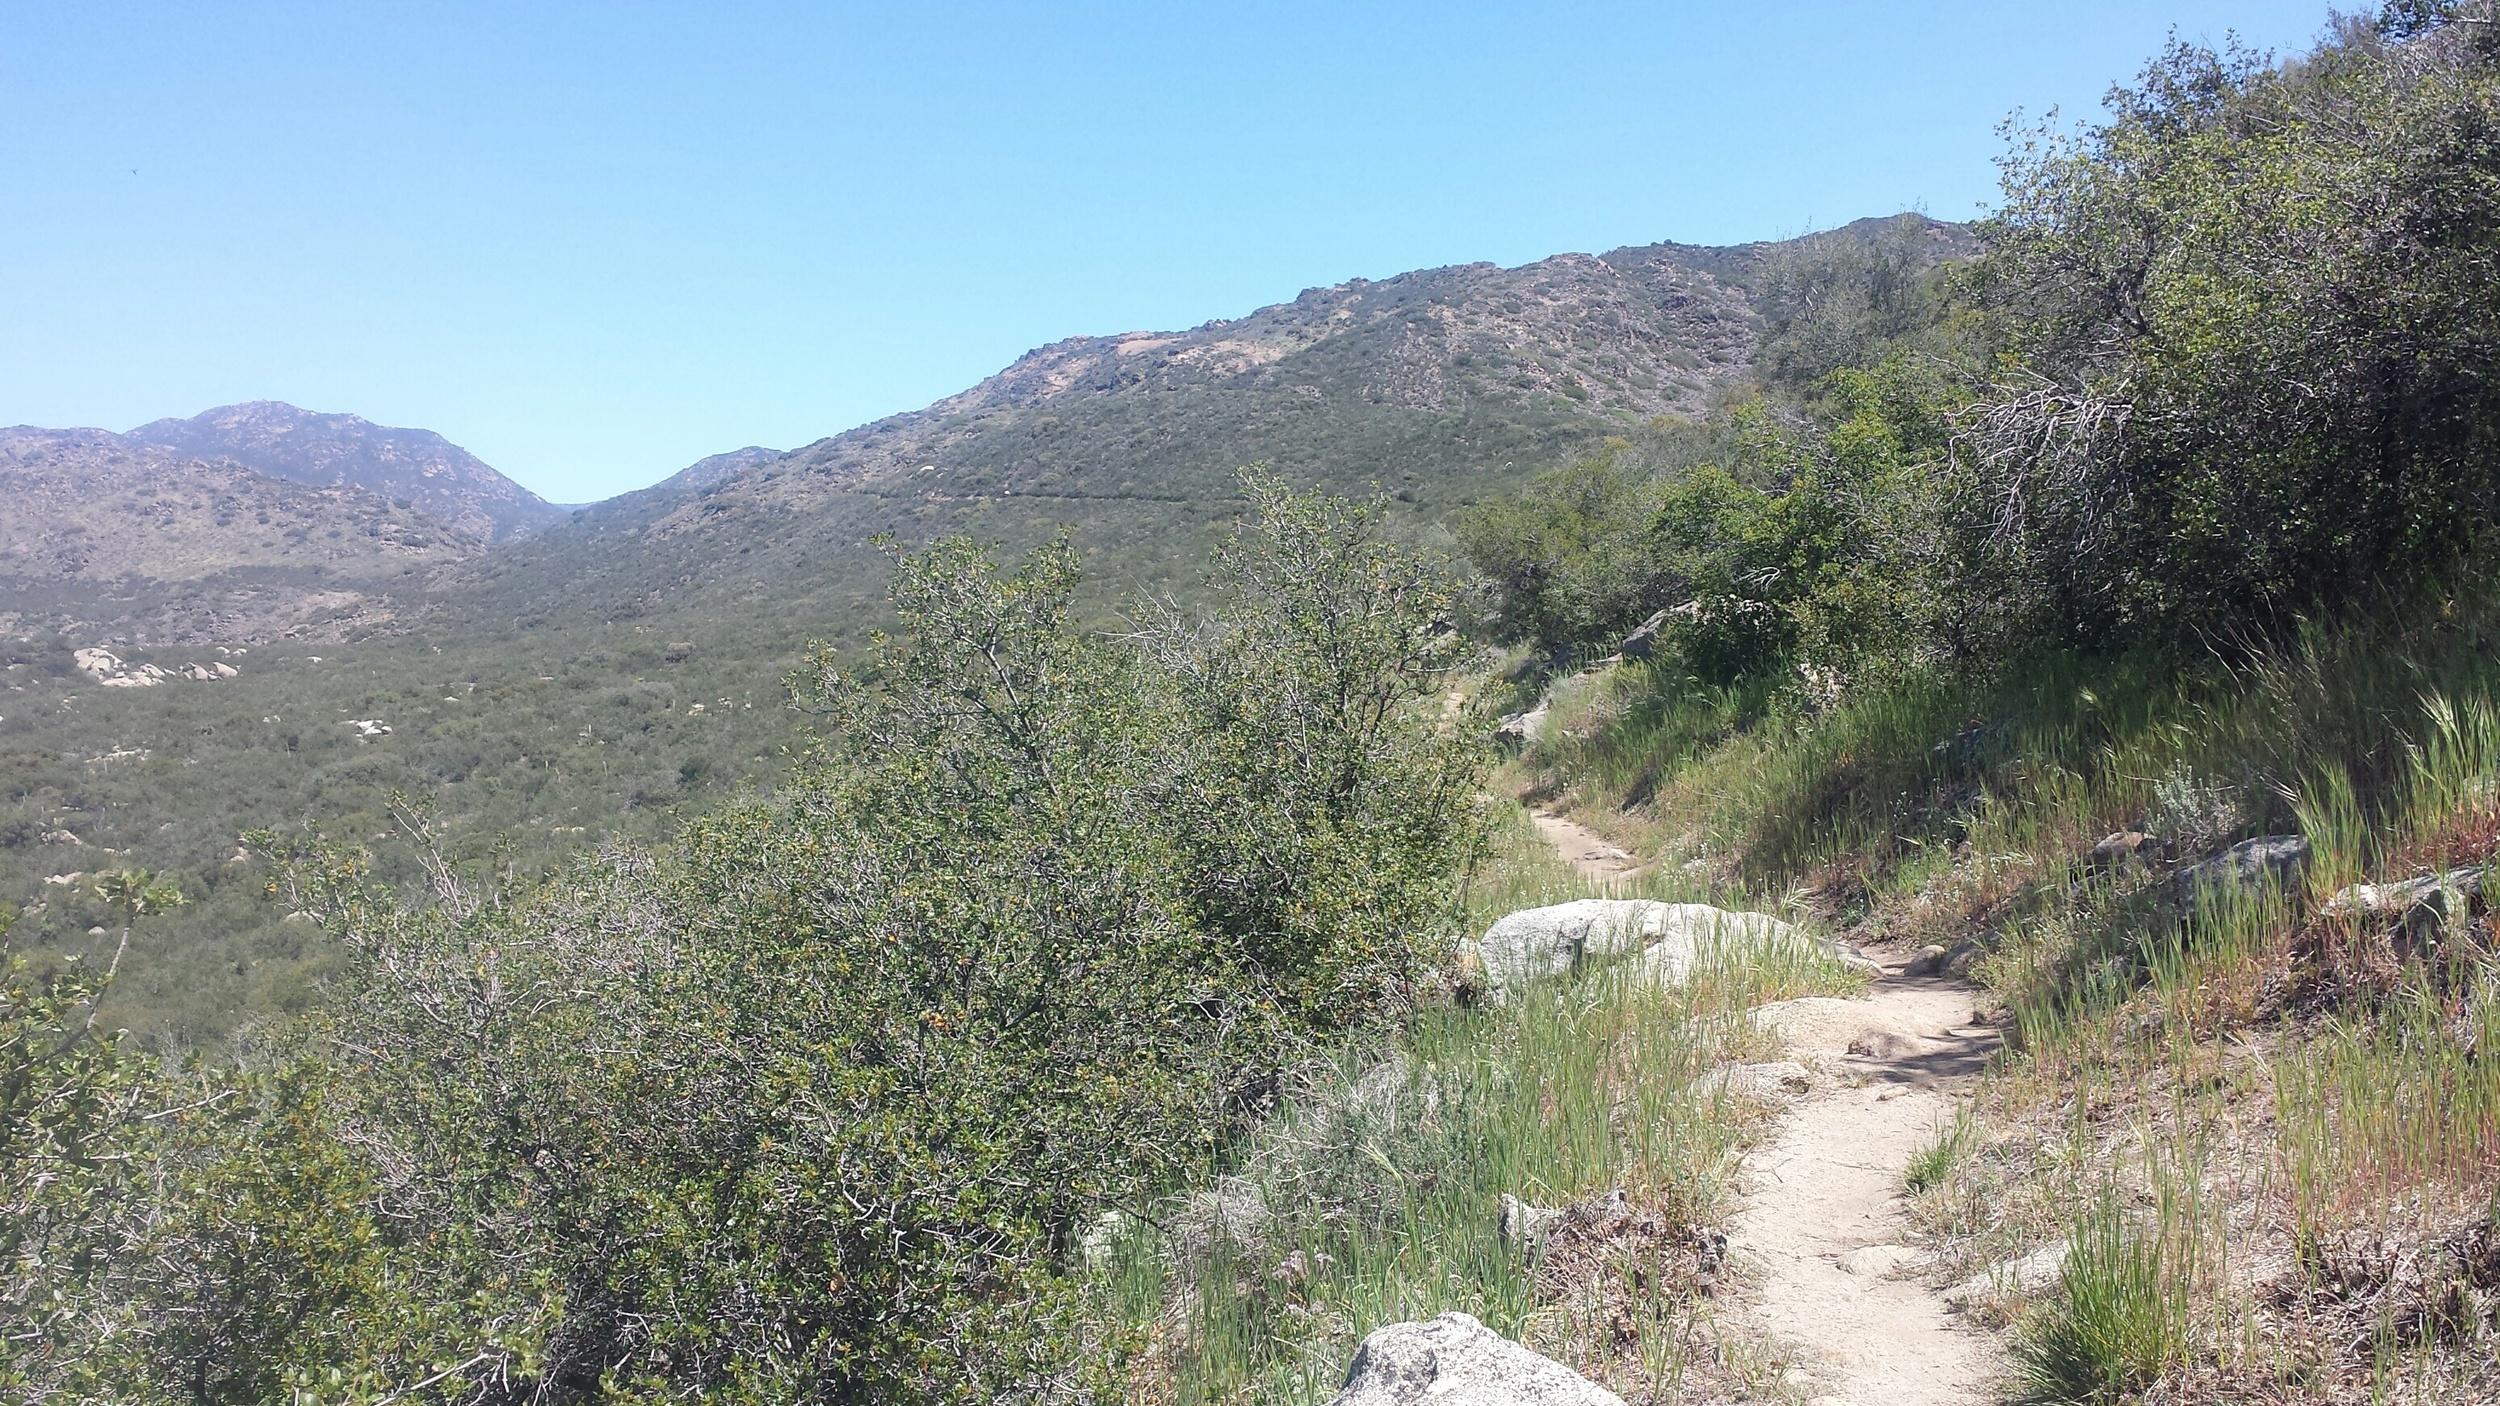 So much trail.